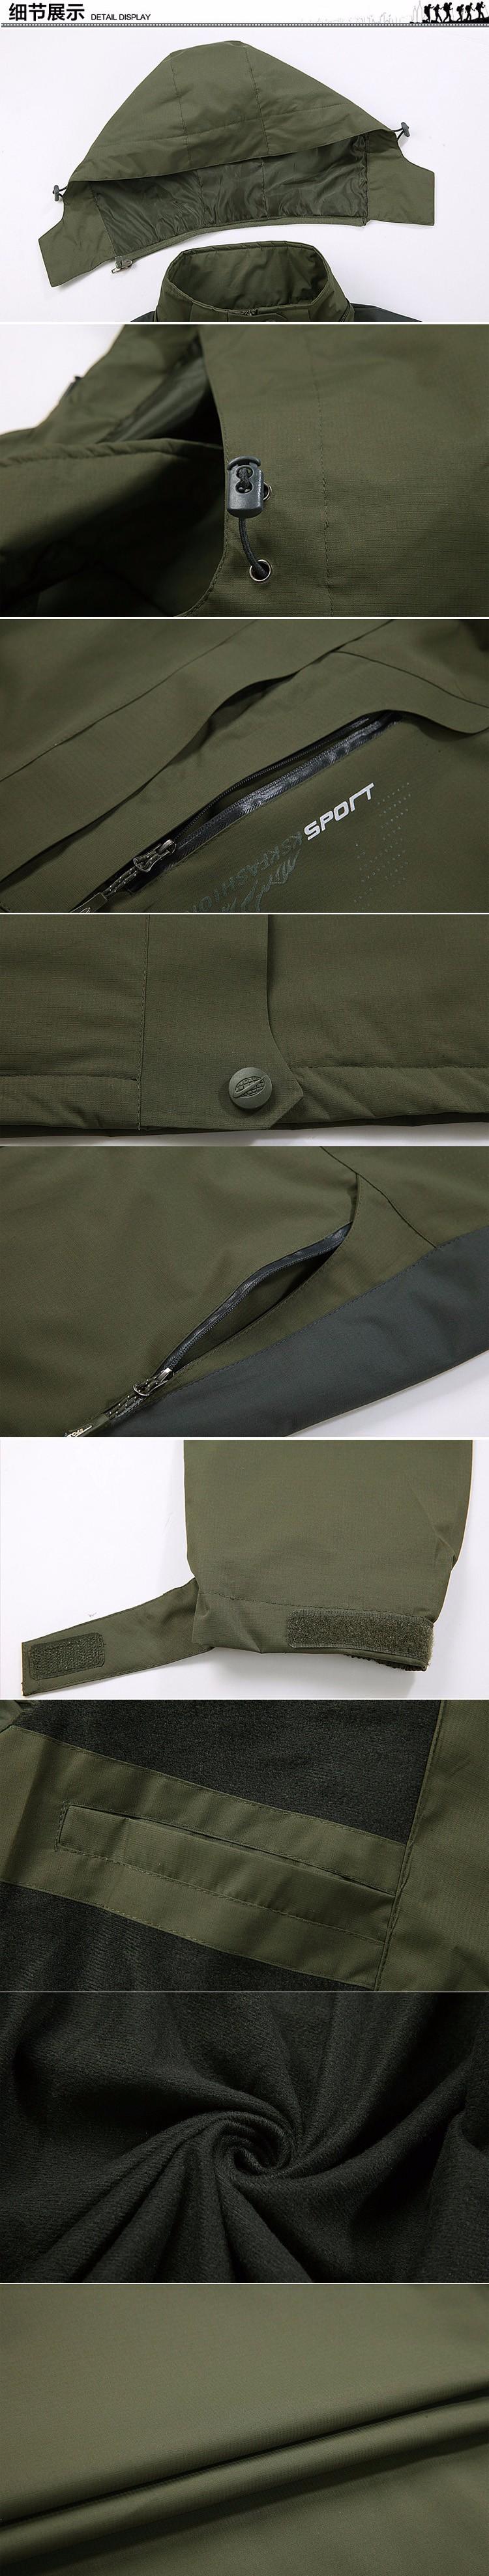 men women jacket (6)